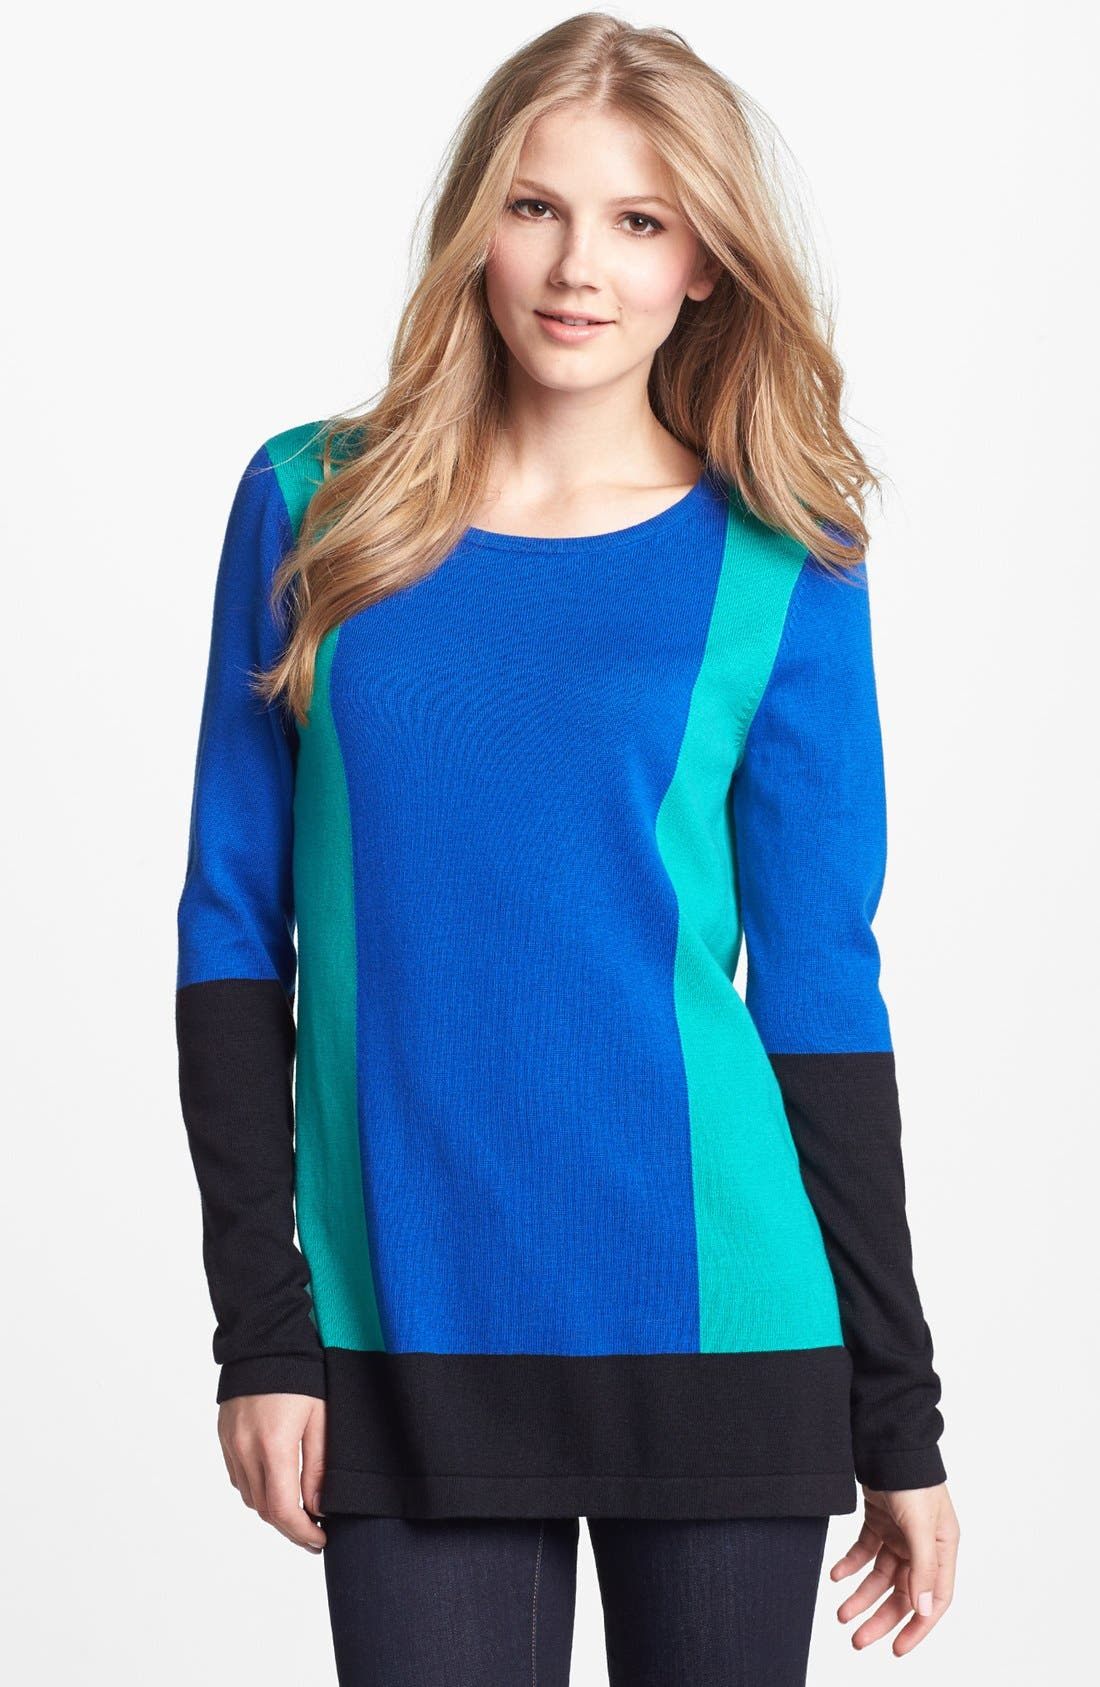 Alternate Image 1 Selected - Vince Camuto Colorblock Cotton Blend Sweater (Petite)